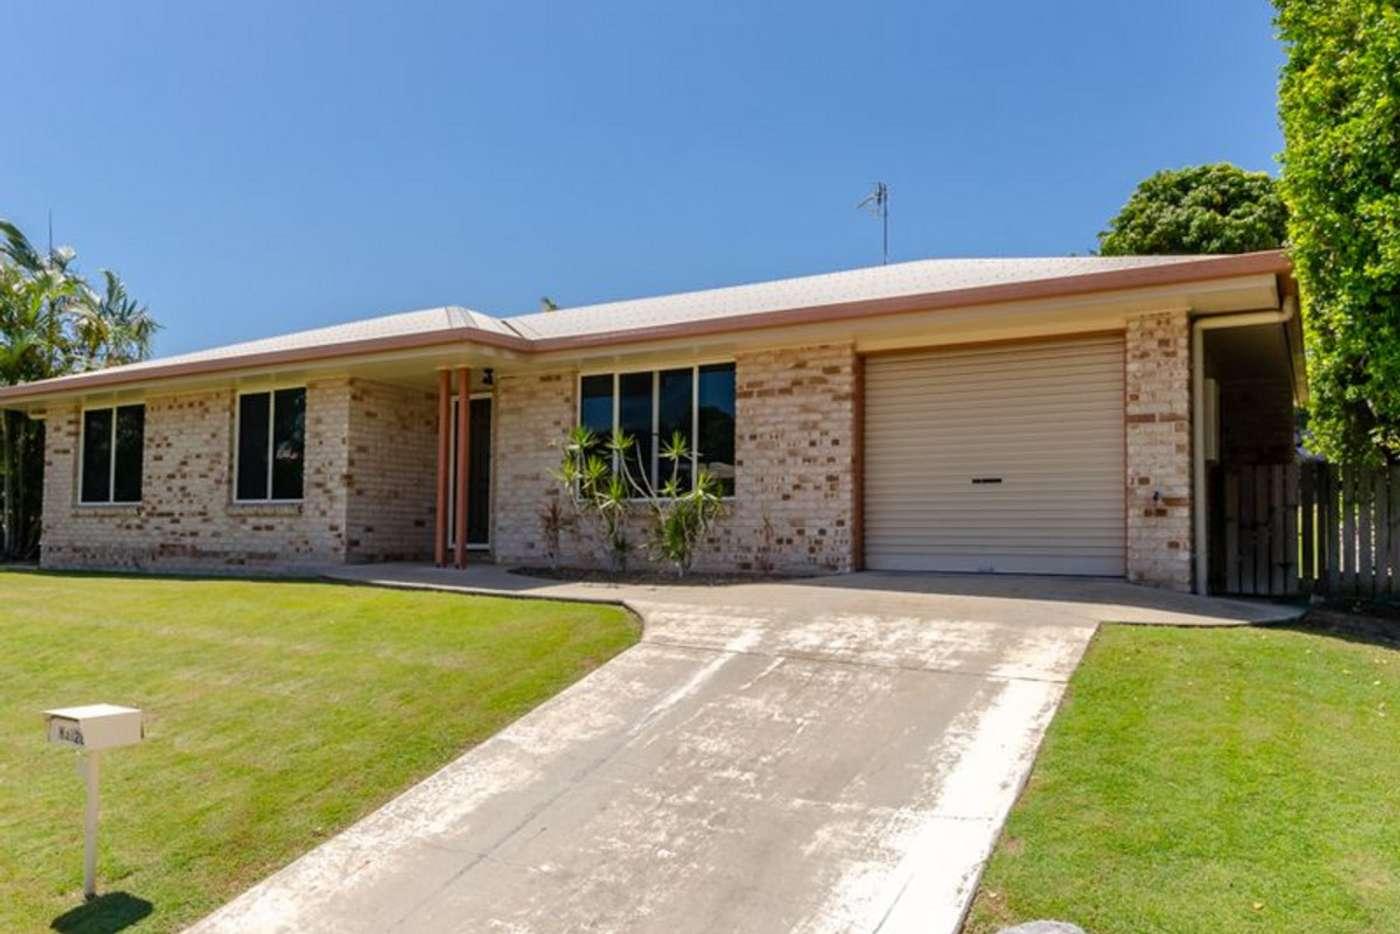 Main view of Homely house listing, 28 Beltana Drive, Boyne Island QLD 4680